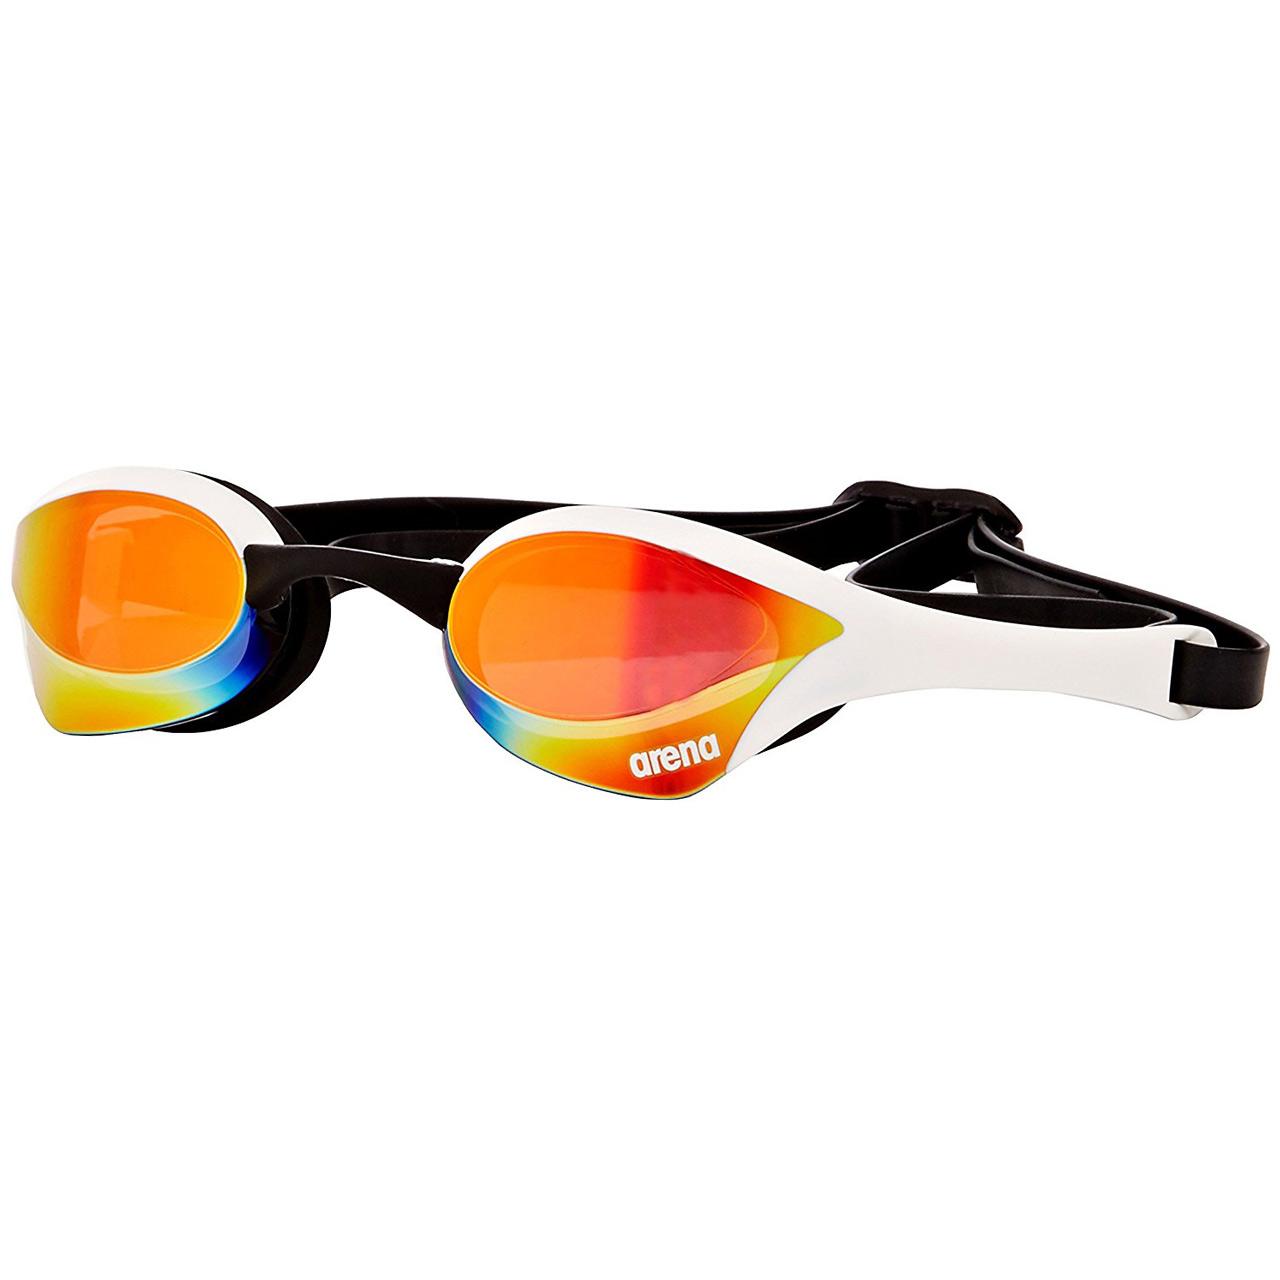 عینک شنا آرنا سری Racing مدل Cobra Ultra Mirror سفید سایز 4